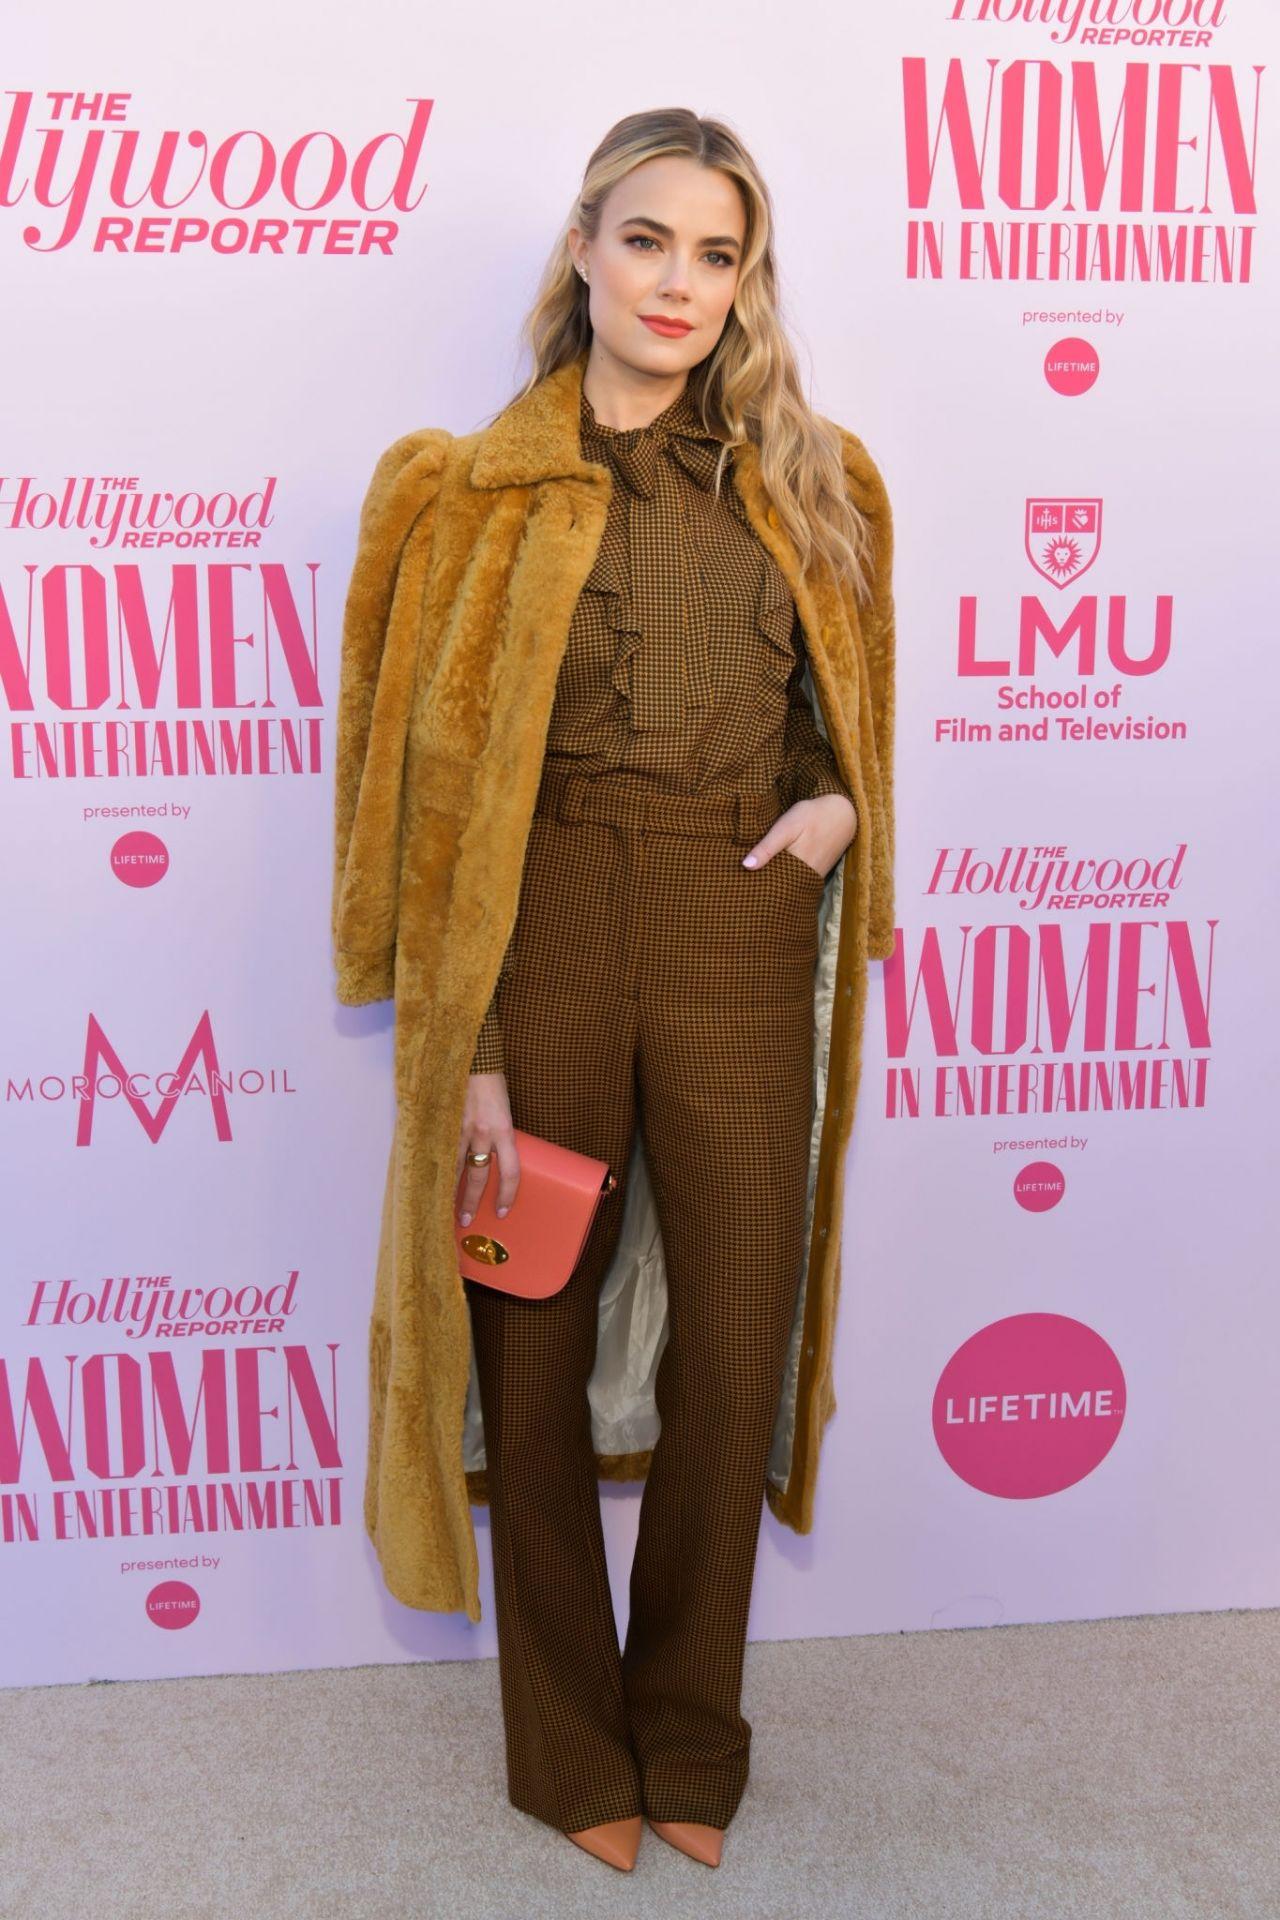 rebecca-rittenhouse-in-mulberry-2019-hollywood-reporters-women-in-entertainment-breakfast-gala